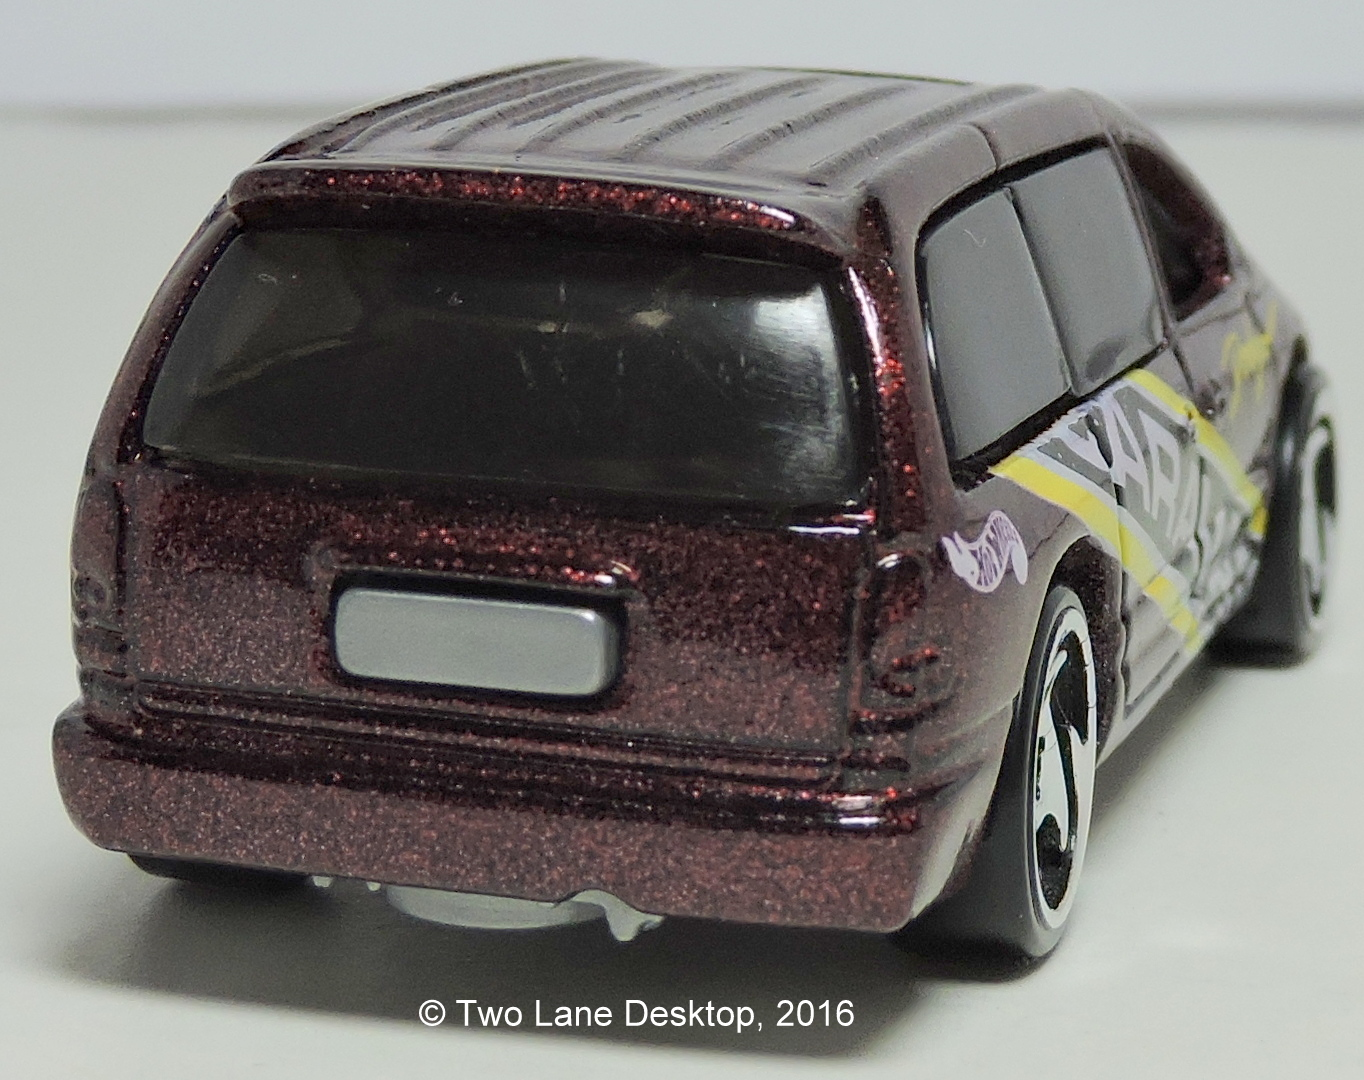 Hot Wheels Chrysler >> Two Lane Desktop: Hot Wheels 1998 Dodge Caravan and 2014 Honda Odyssey